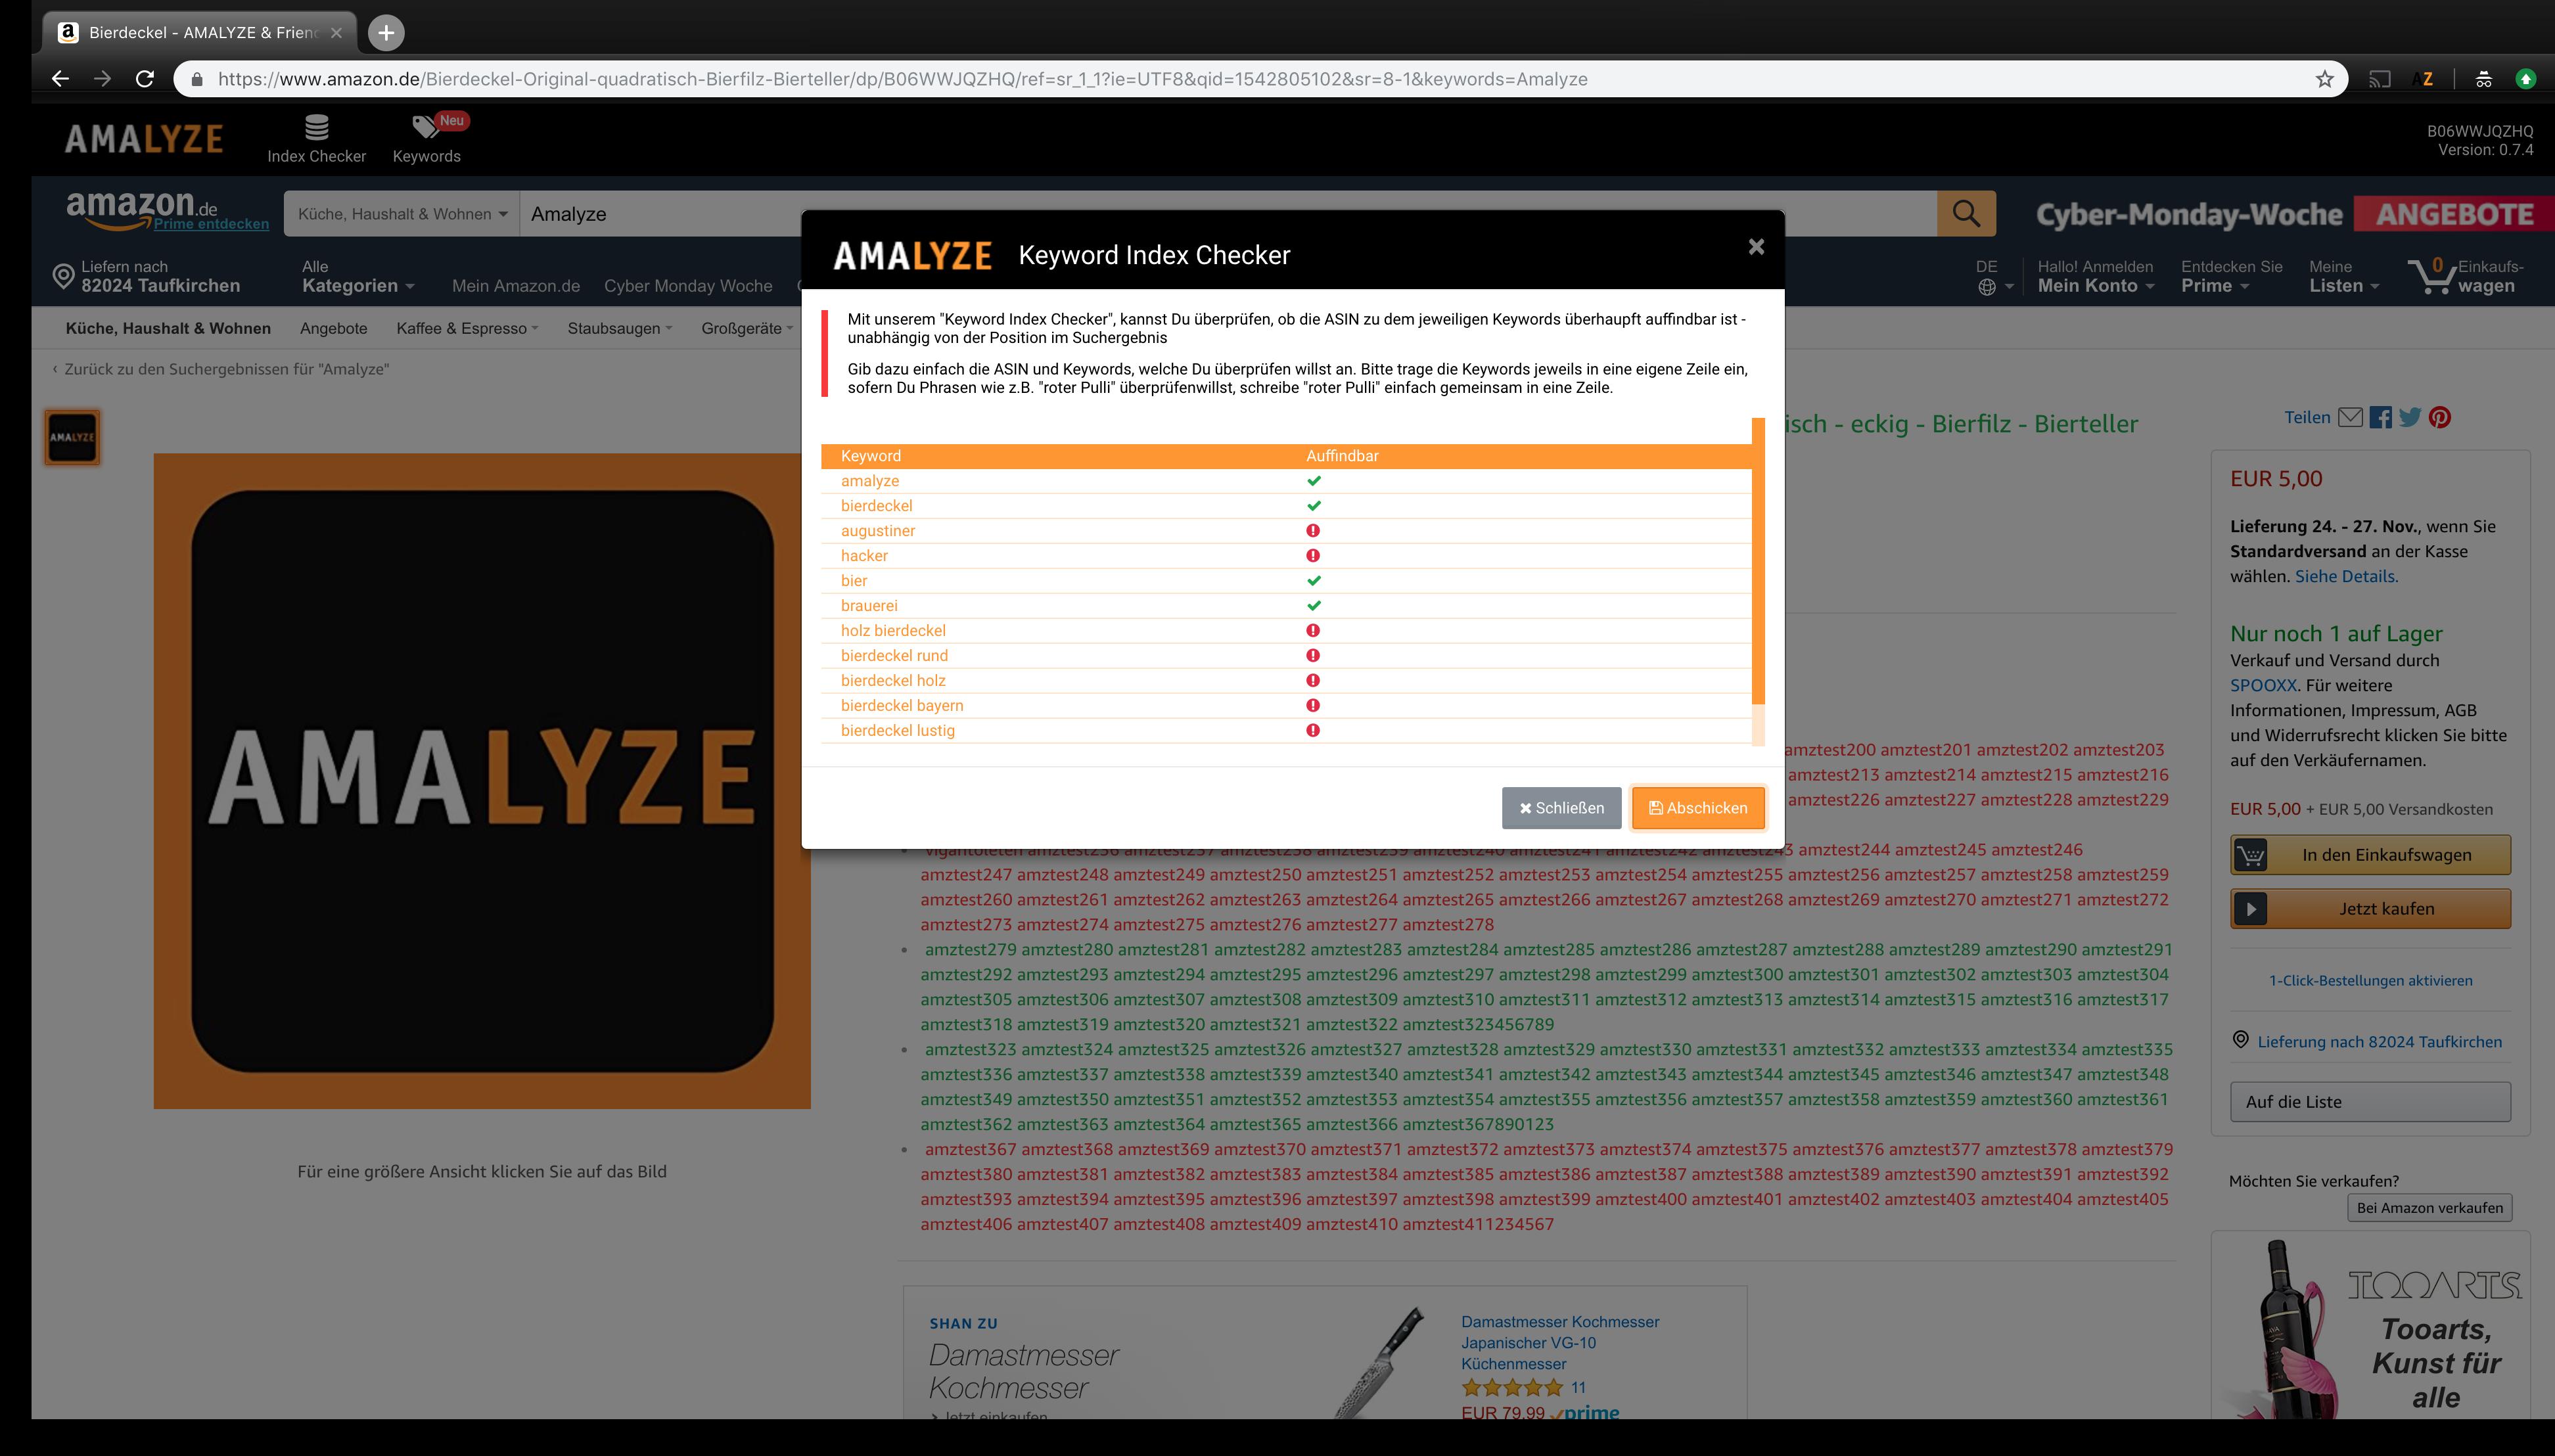 AMALYZE Index Checker - Eigene Keywords überprüfen